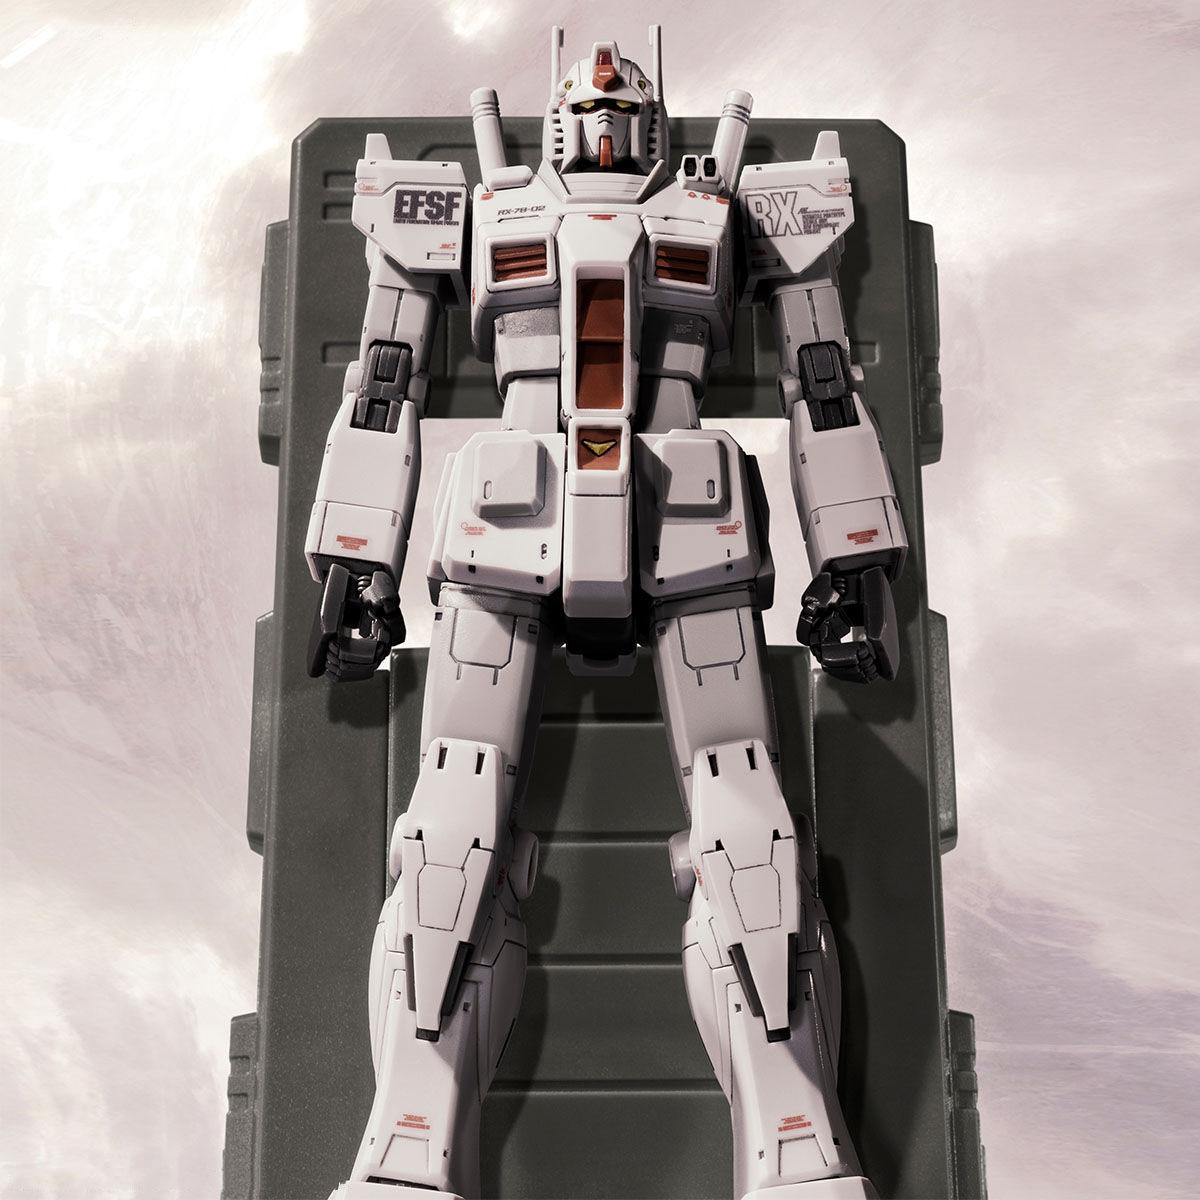 HG 1/144 RX-78-02 GUNDAM ROLLOUT COLOR (GUNDAM THE ORIGIN Ver.) [2021年5月發送]